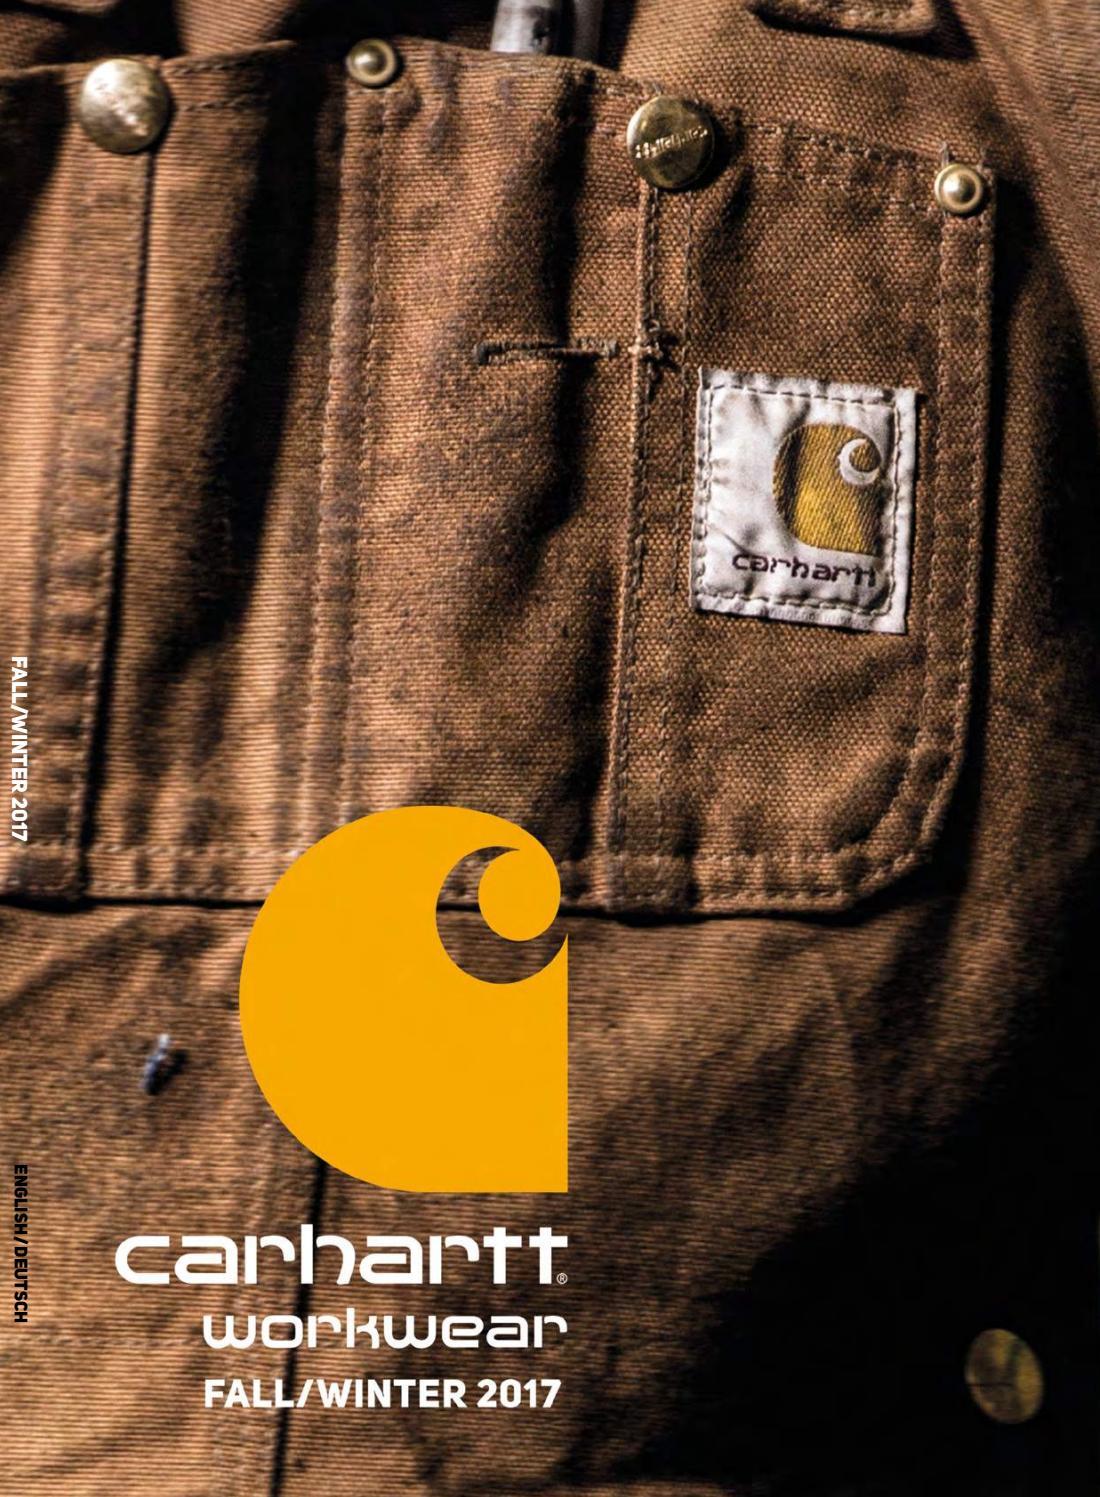 Carhartt Fall Winter 2017 By Feiber Distribution Issuu